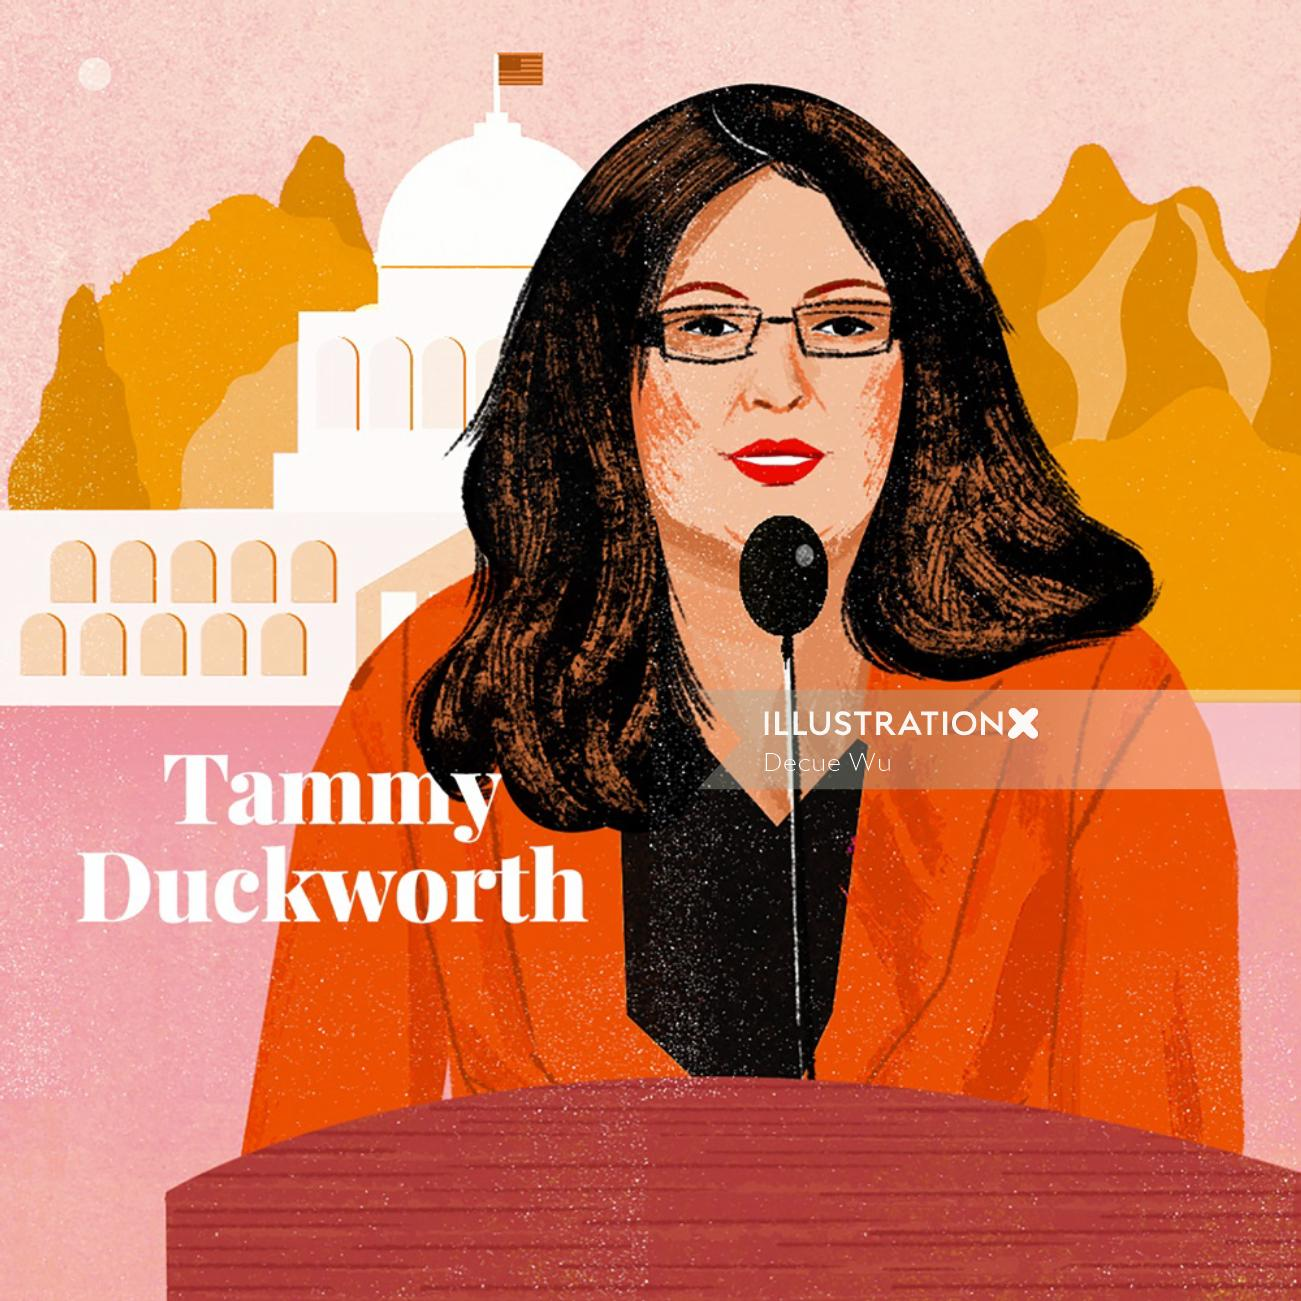 Portrait of Tammy Duckworth